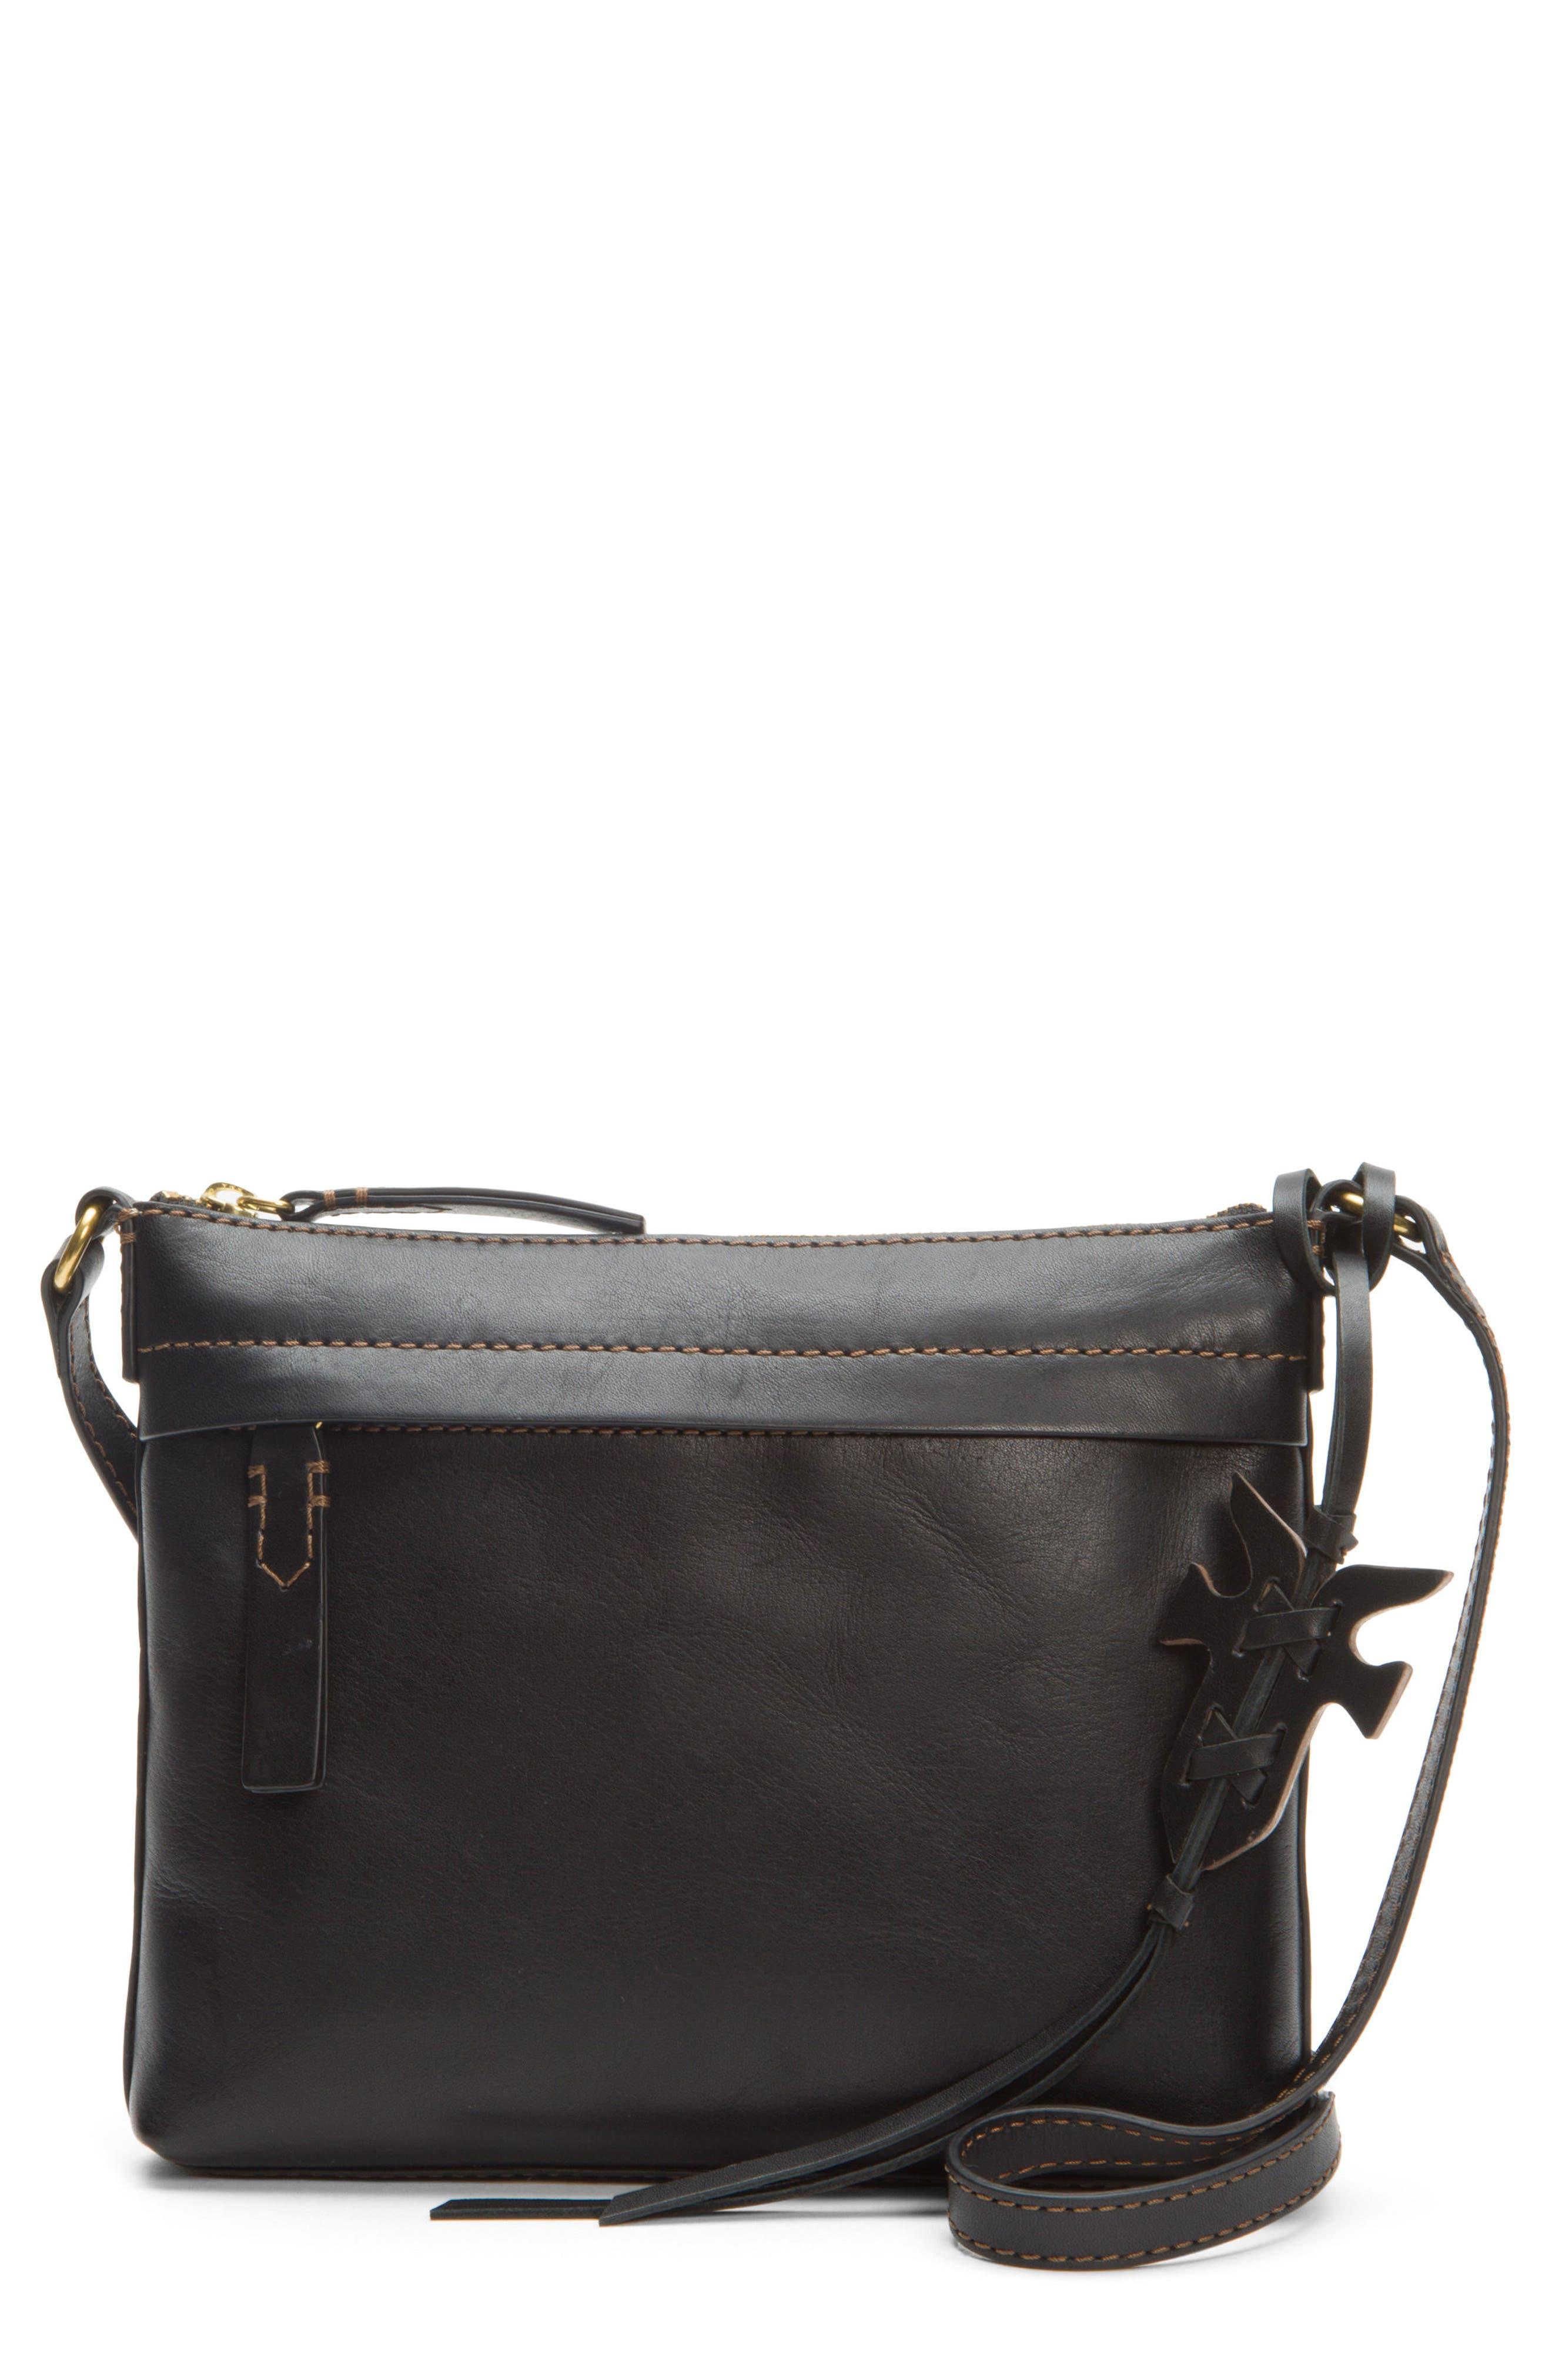 Carson Leather Crossbody Bag,                             Main thumbnail 1, color,                             BLACK